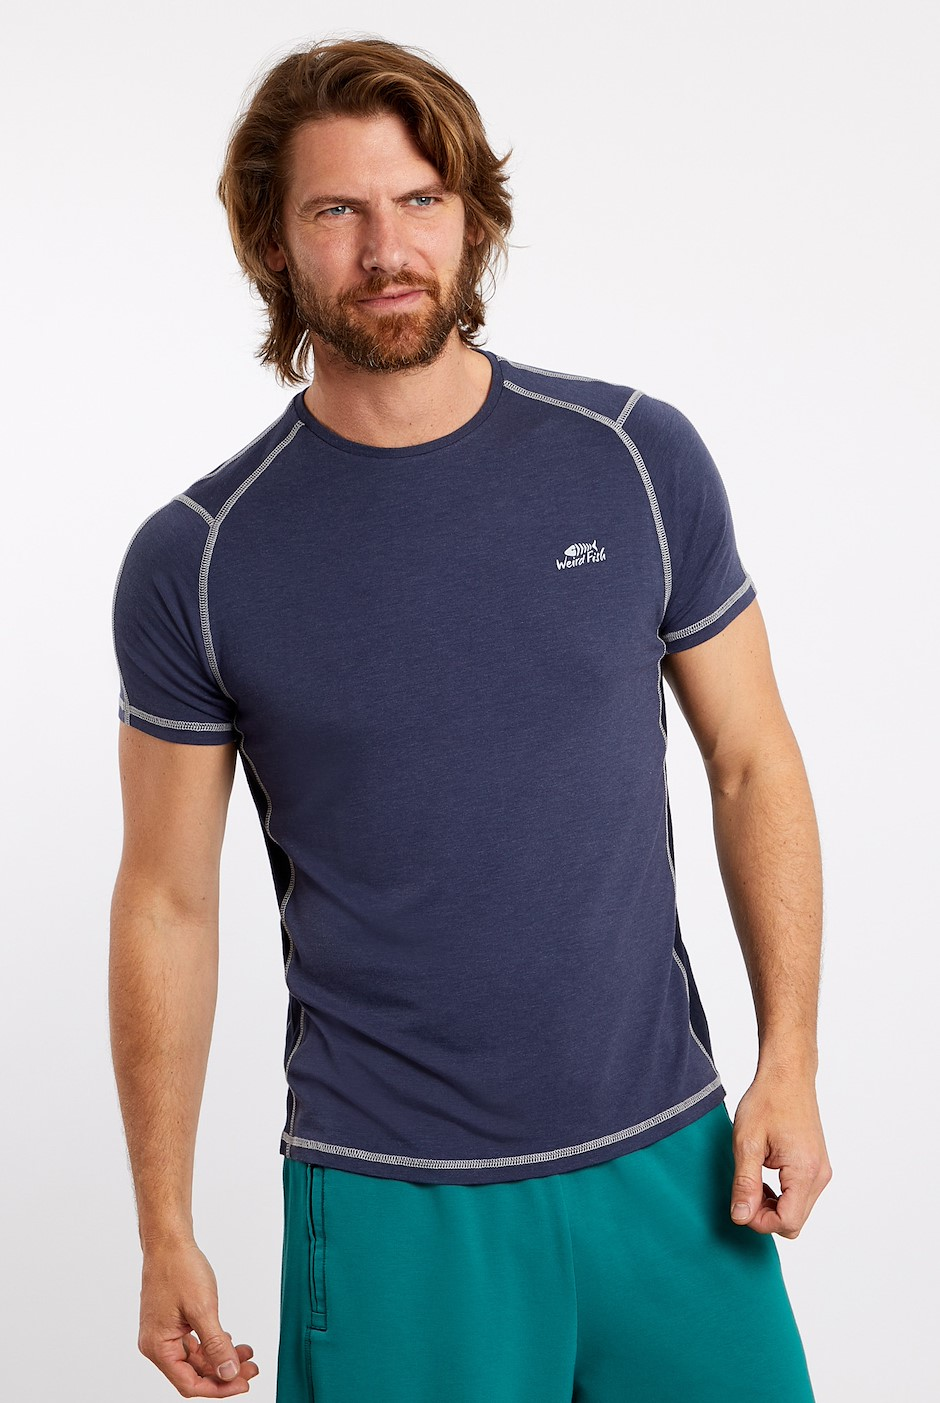 Morpheus Bamboo T-Shirt Navy Marl